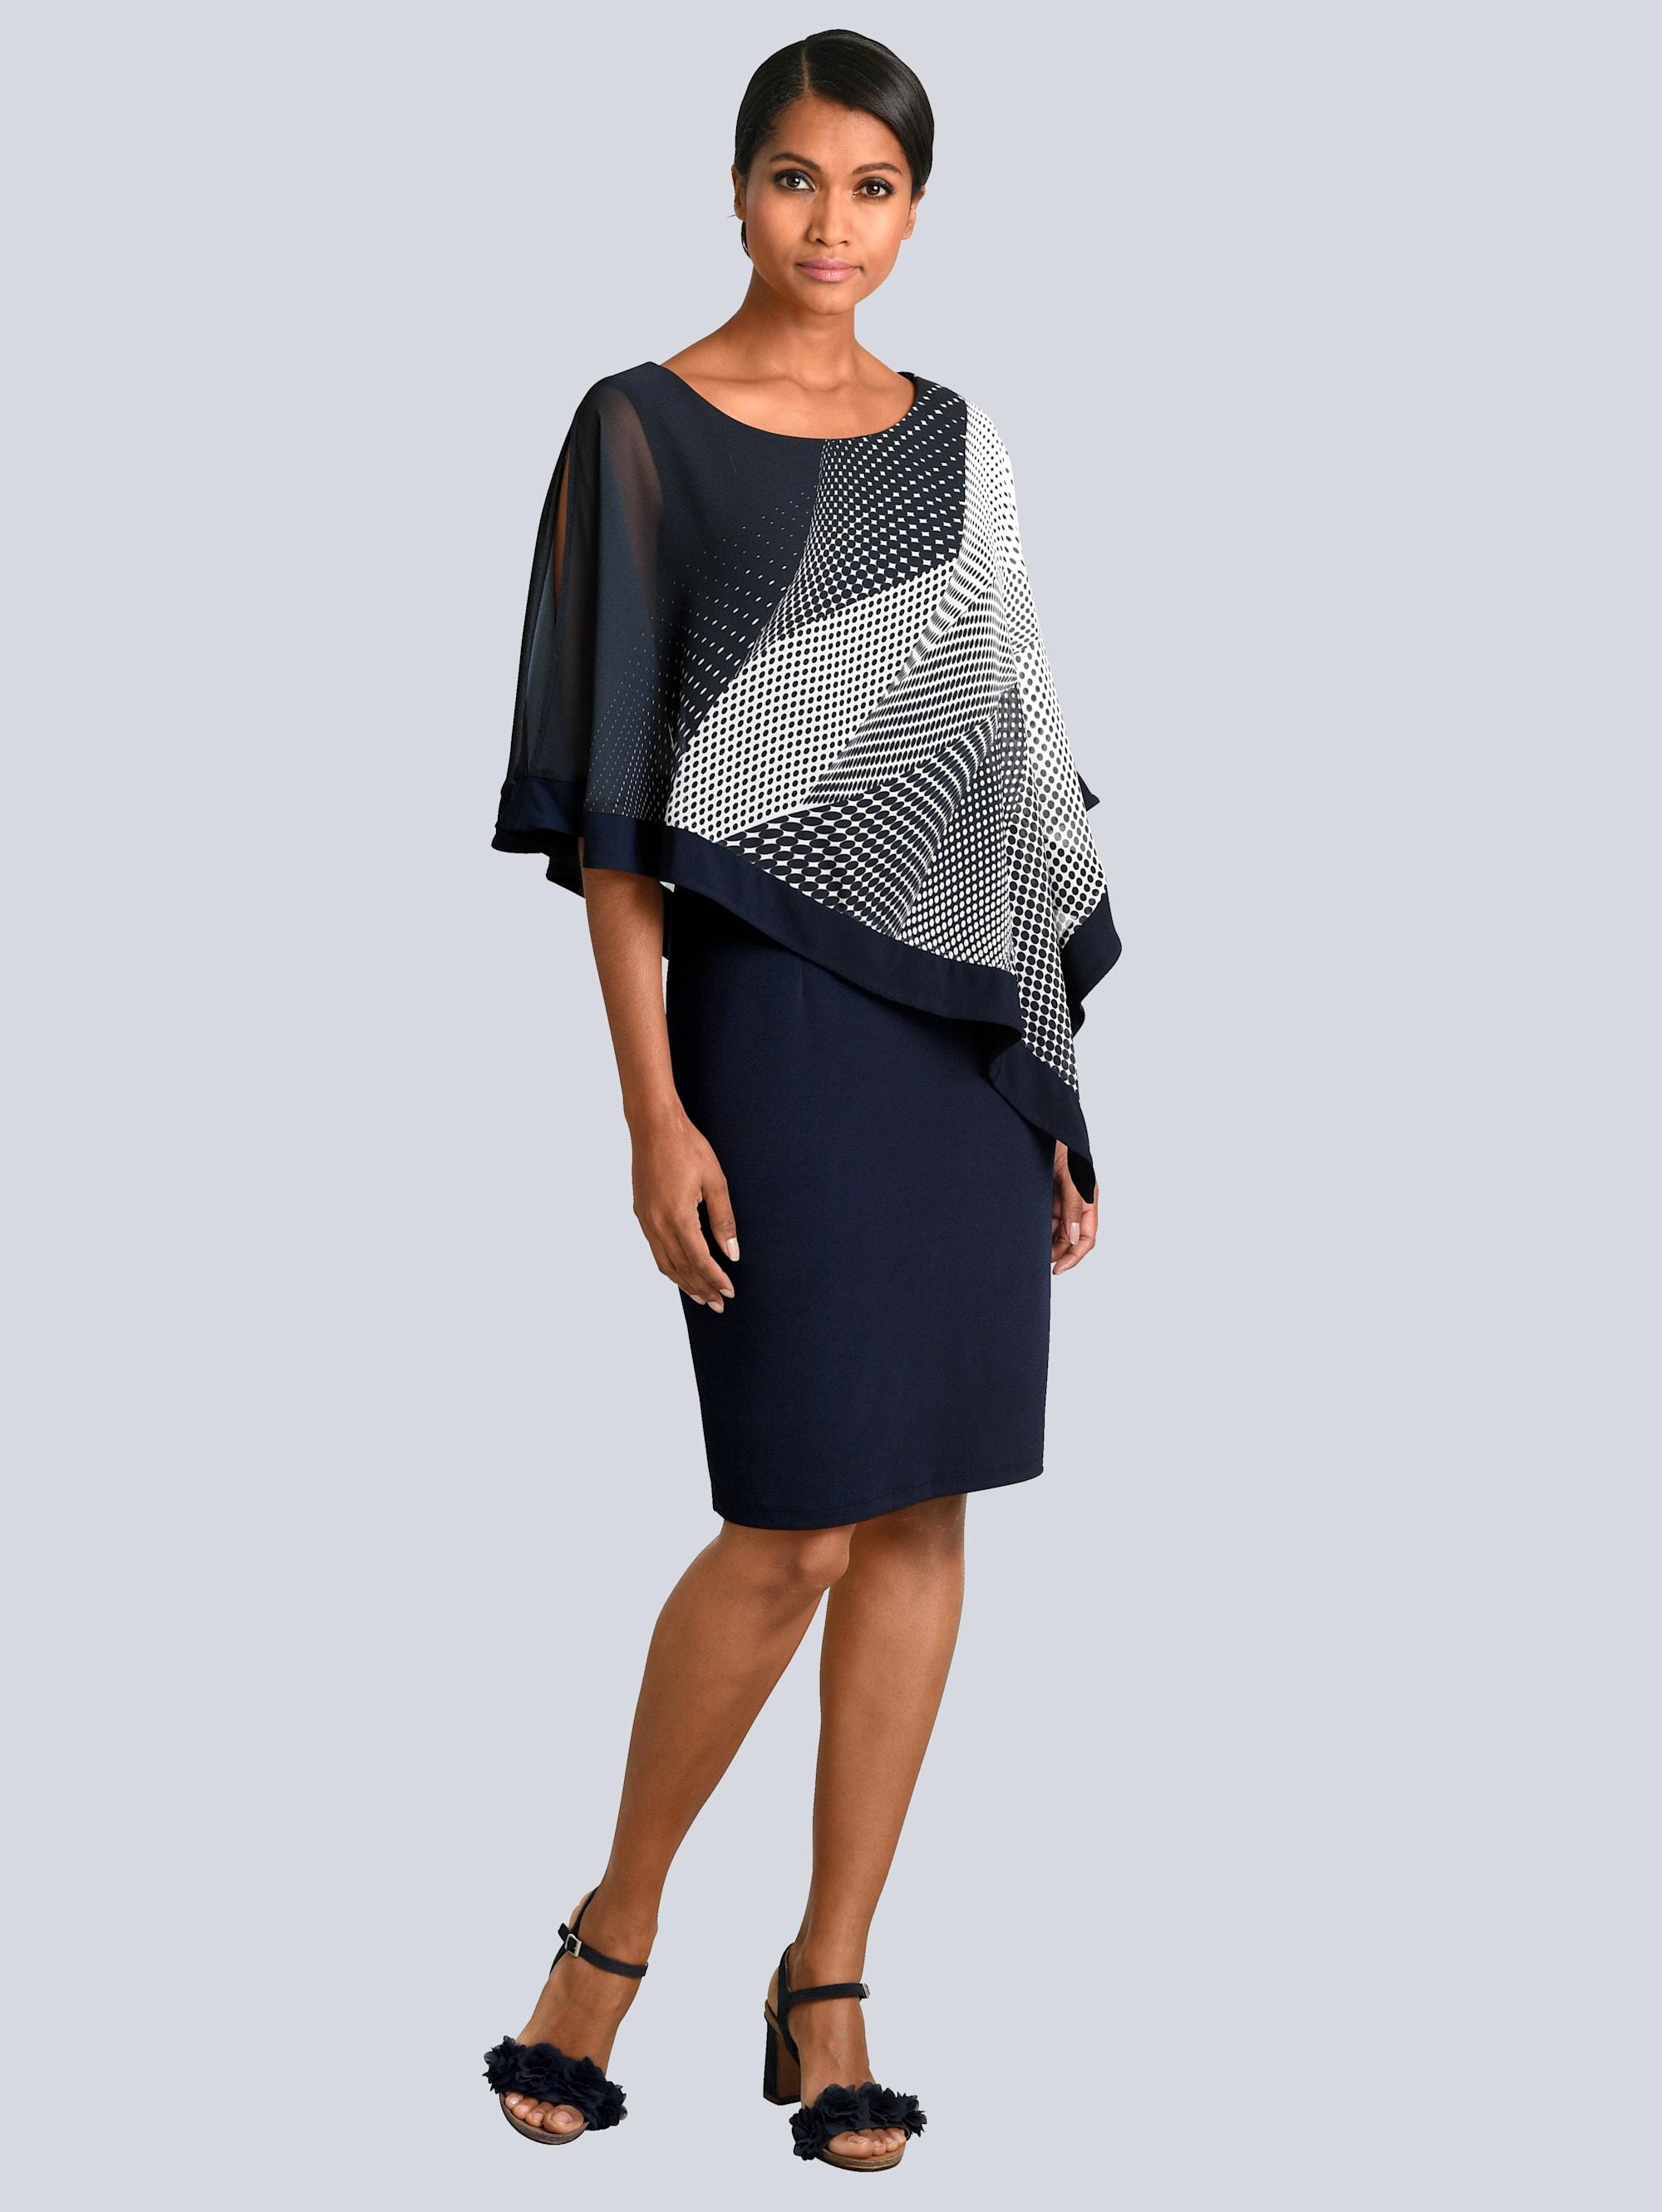 Alba Moda Kleid mit elegantem Chiffon IBV7O r6gKZ